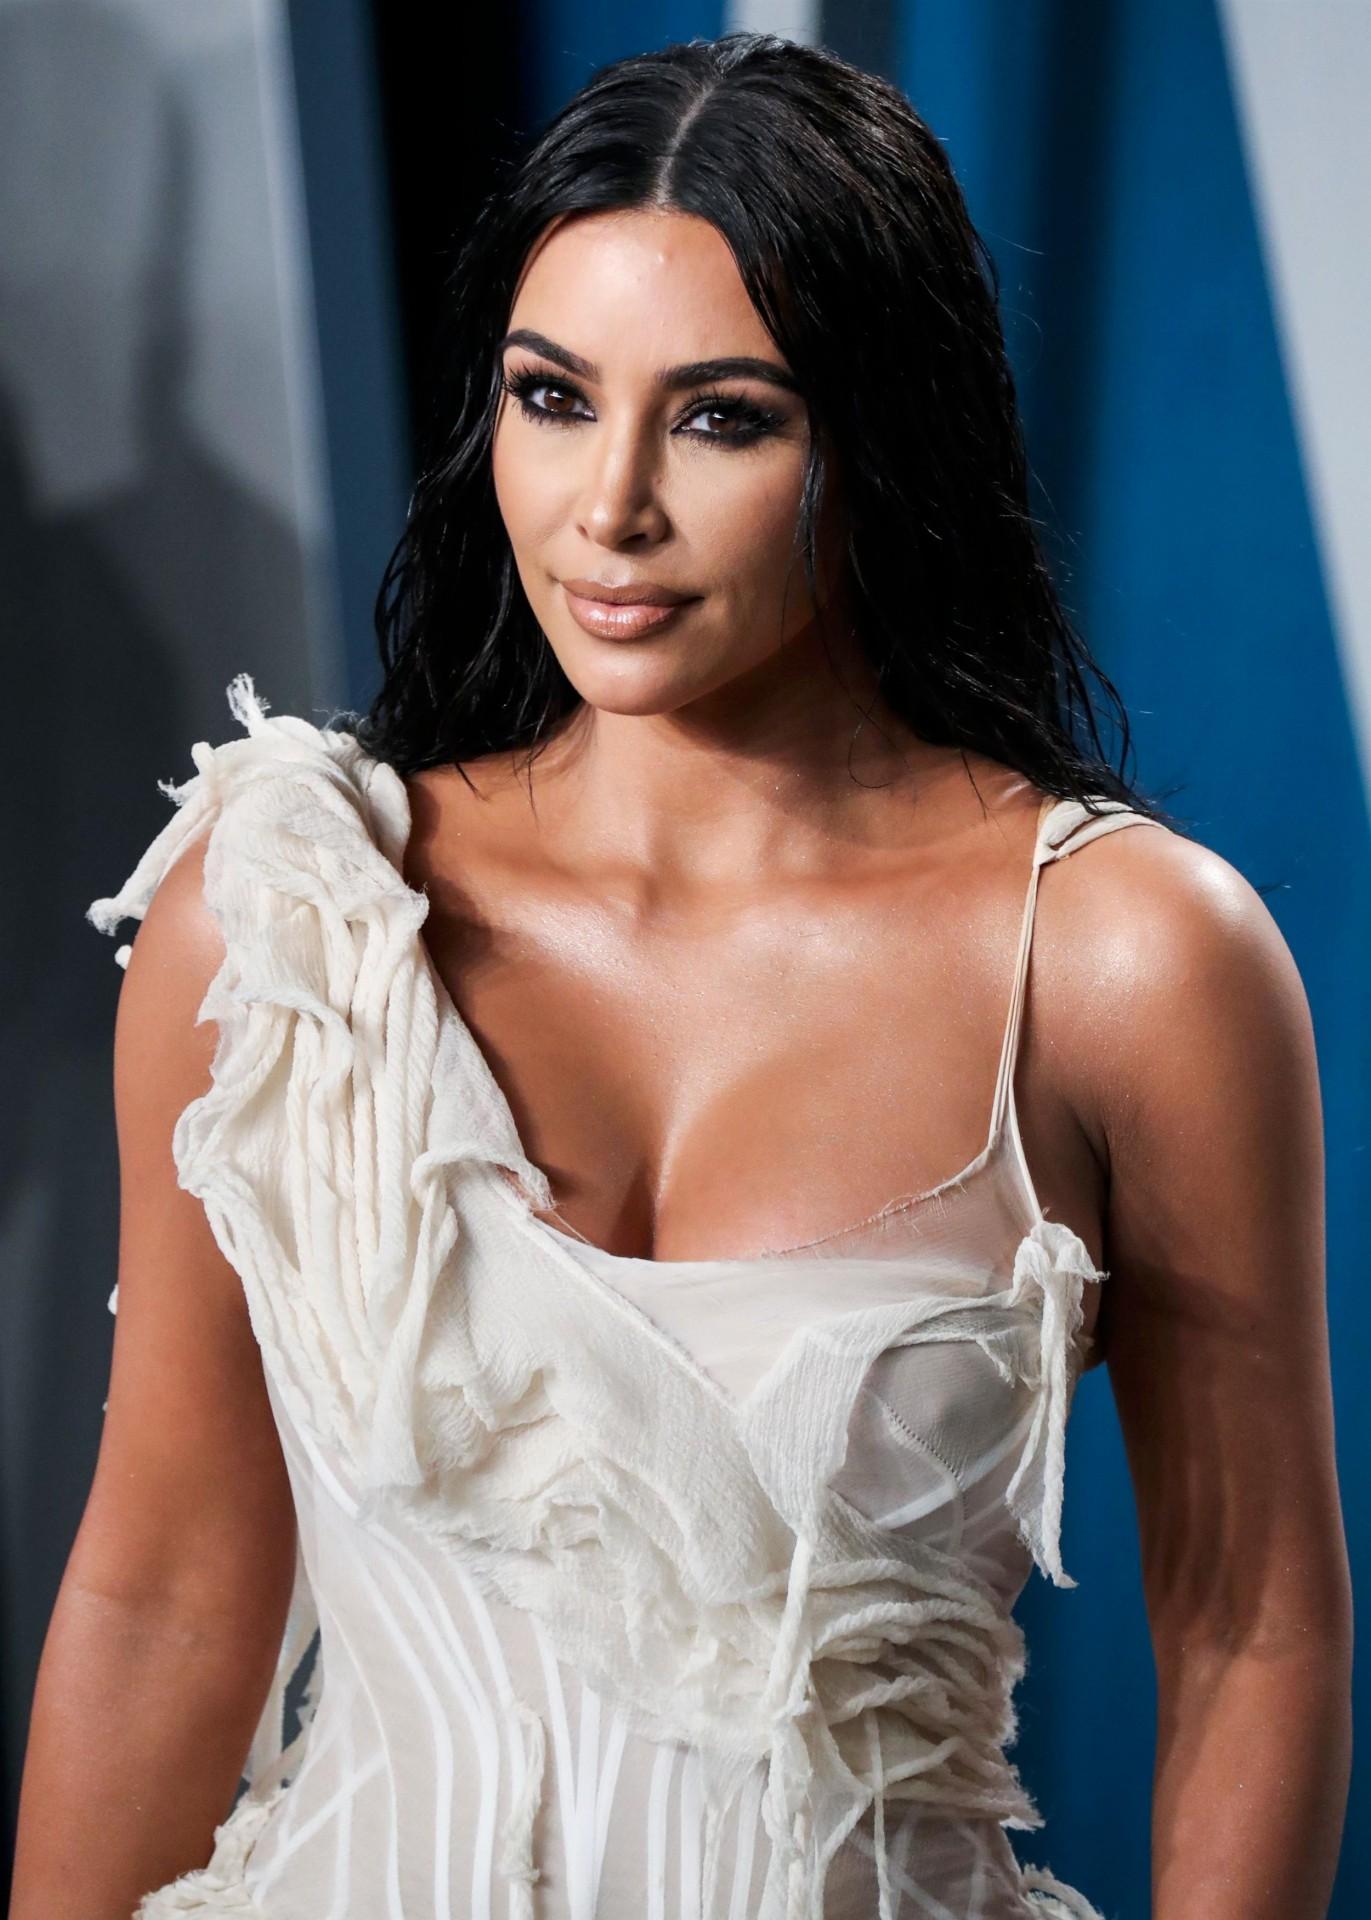 Celebrities Cleavage Pics: Hot Vidya Balan Cleavage